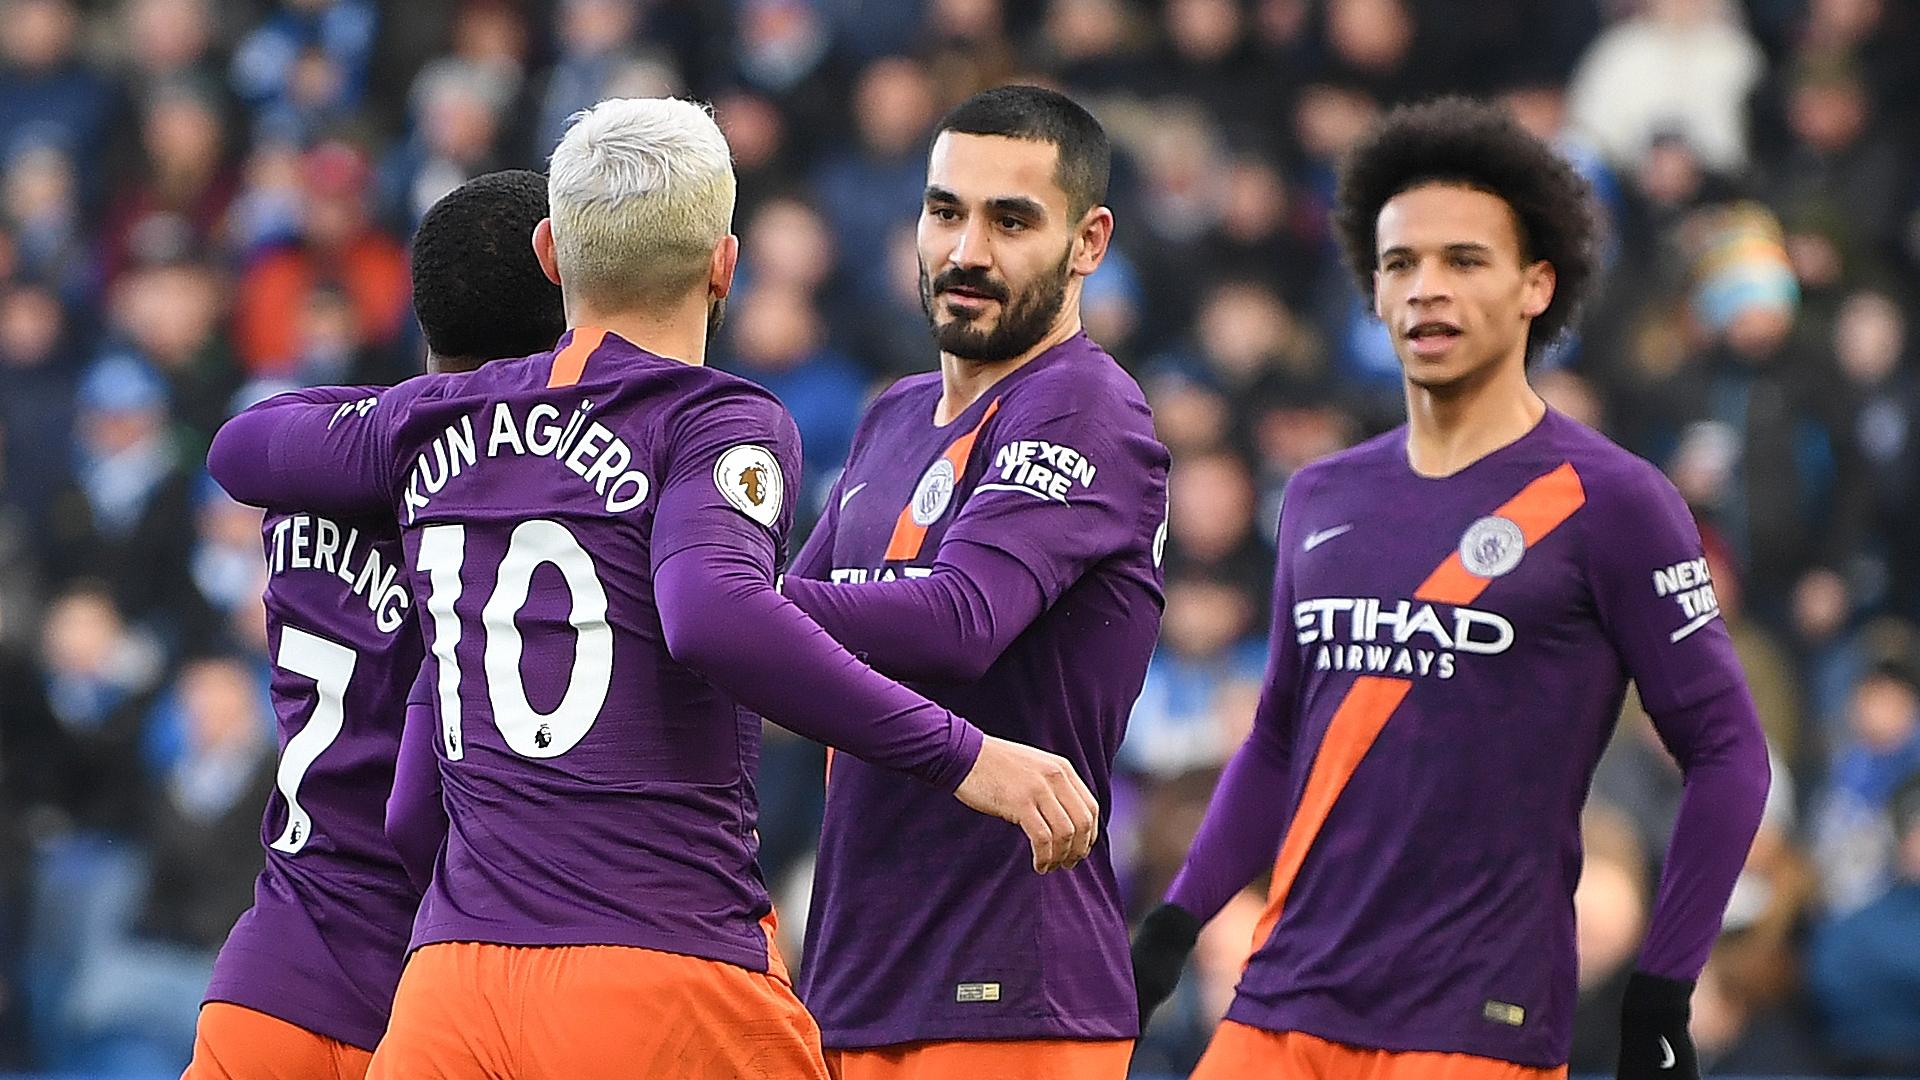 Man City celebrate vs Huddersfield